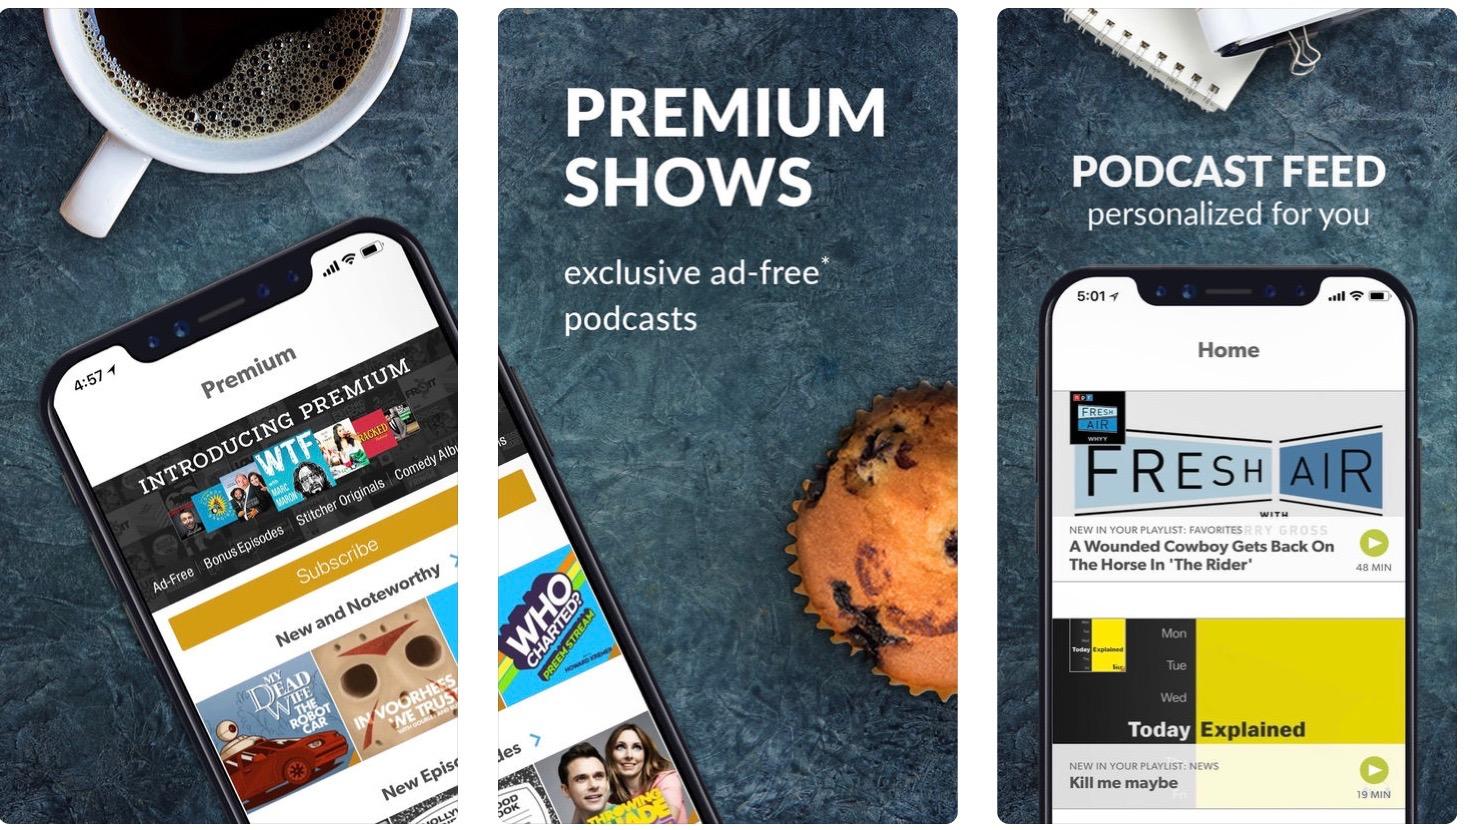 Stitcher for Podcasts on iOS adds Waze integration, CarPlay